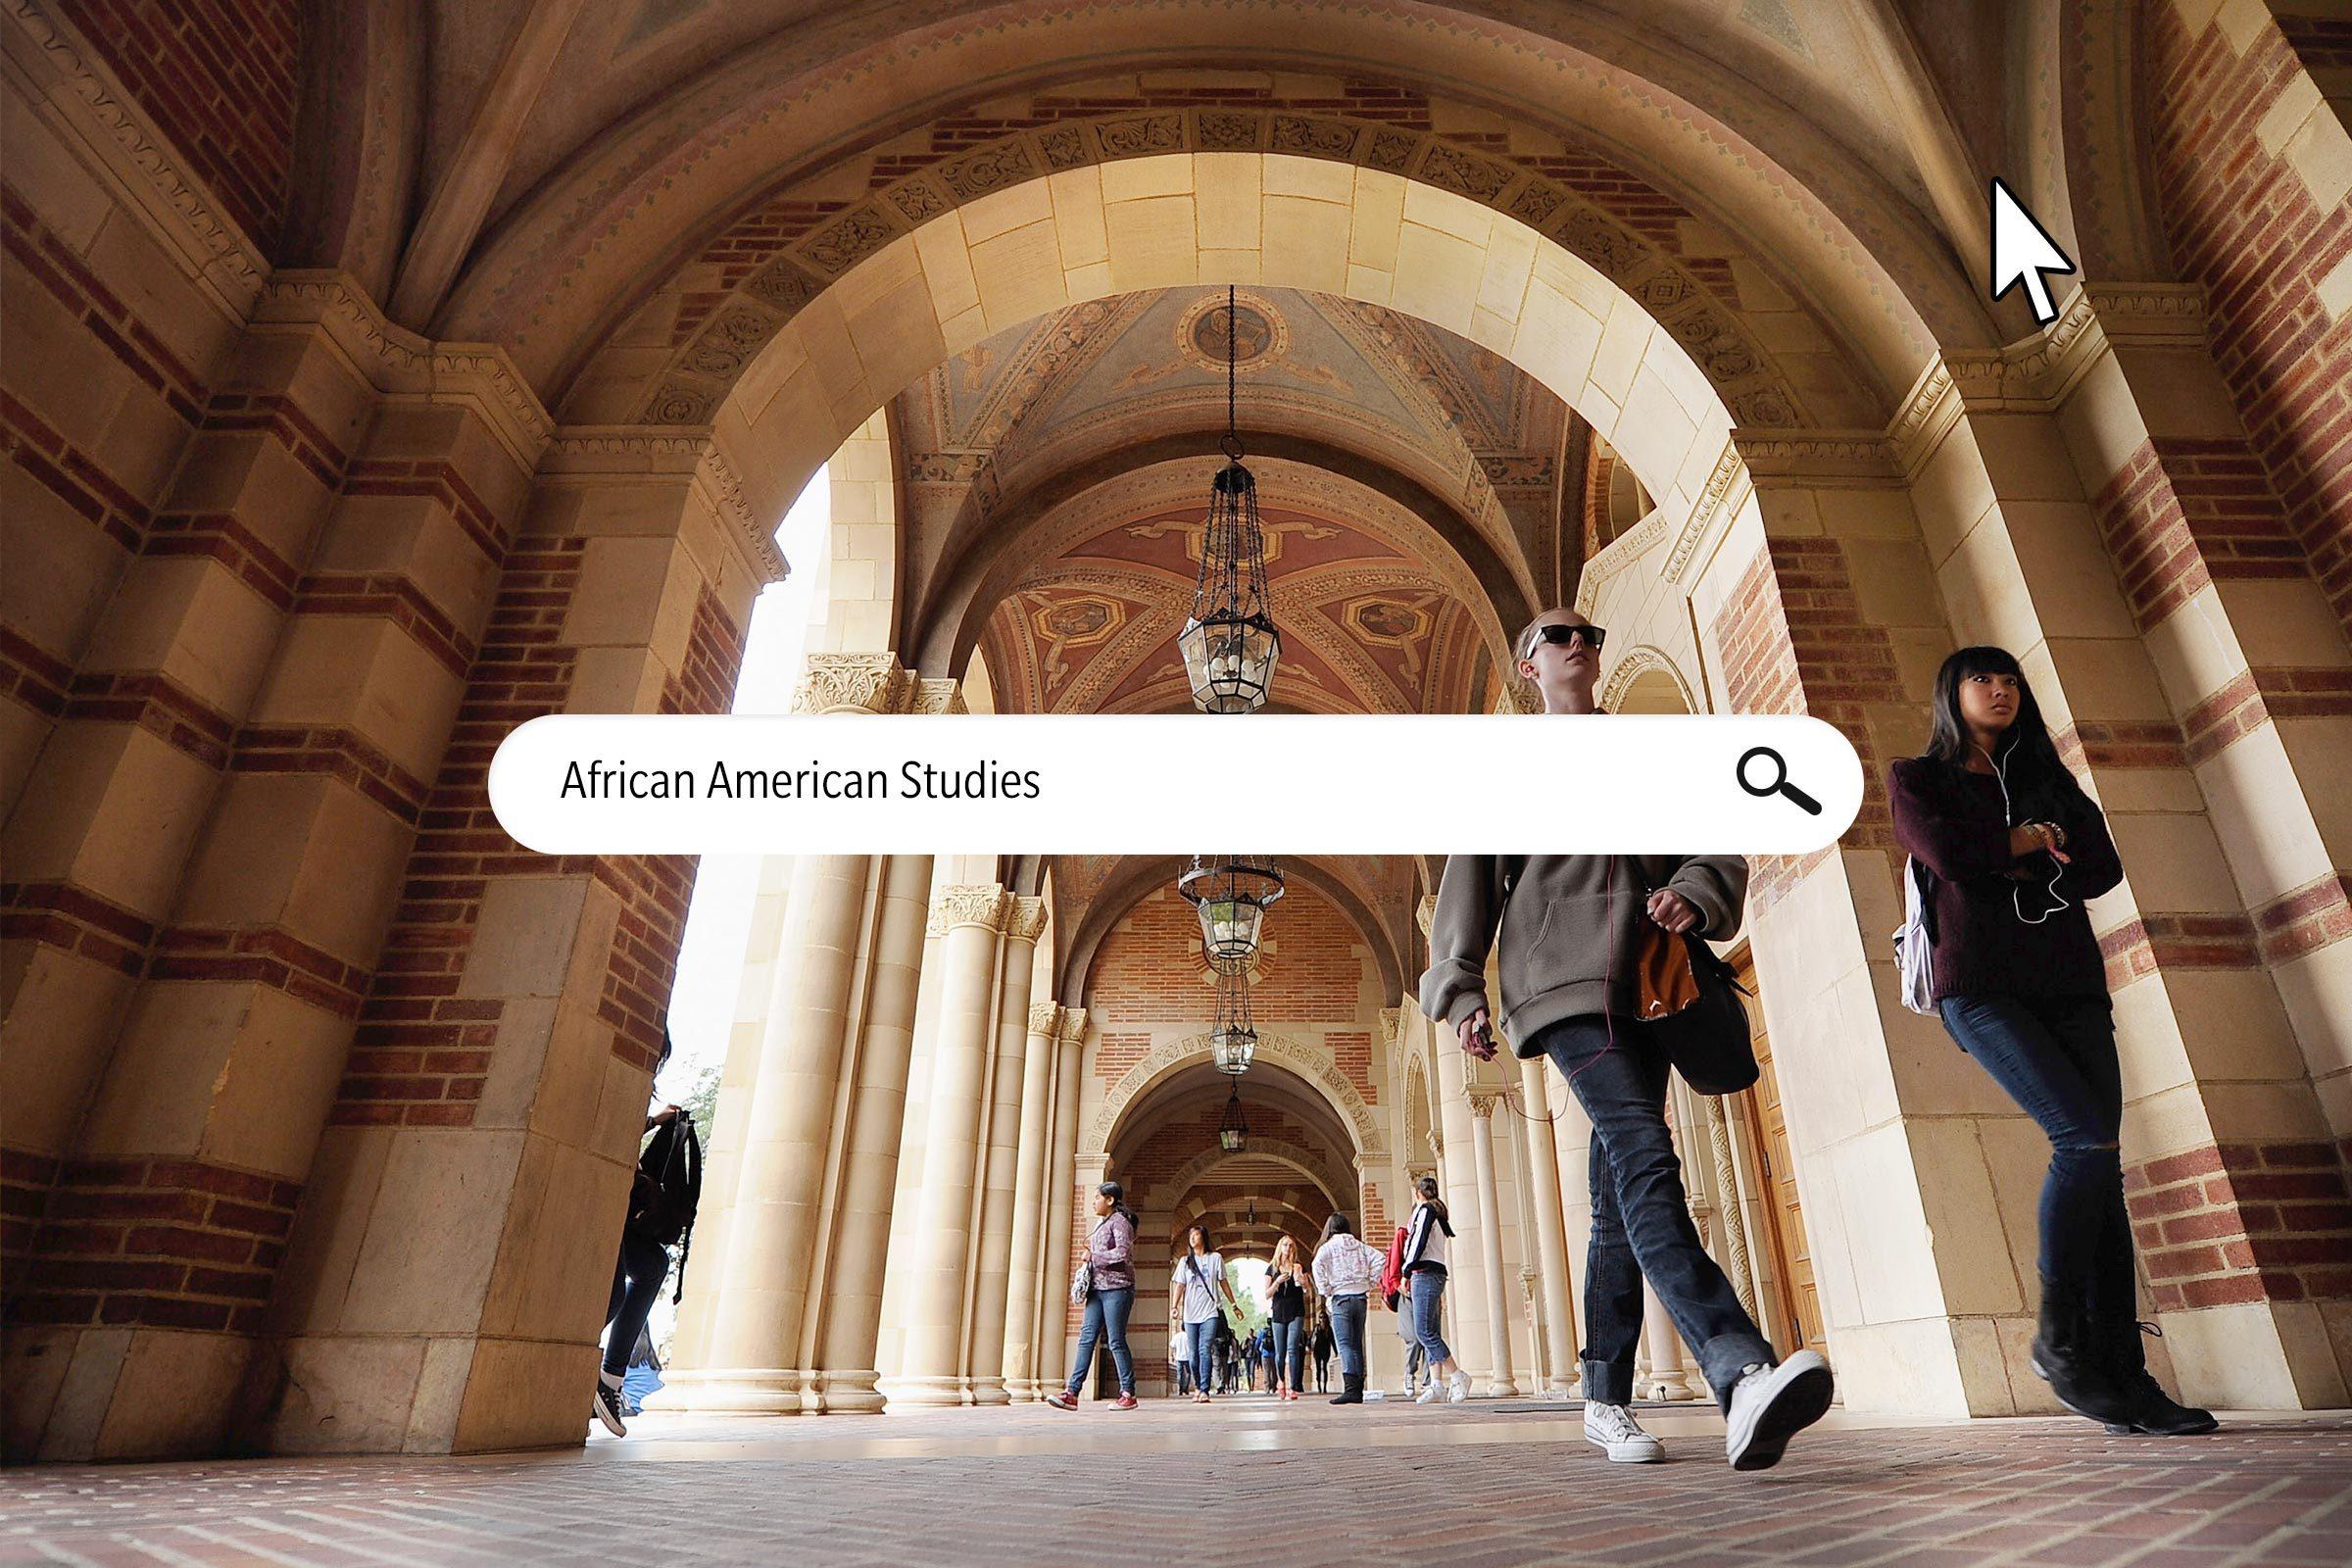 African American Studies (UCLA)